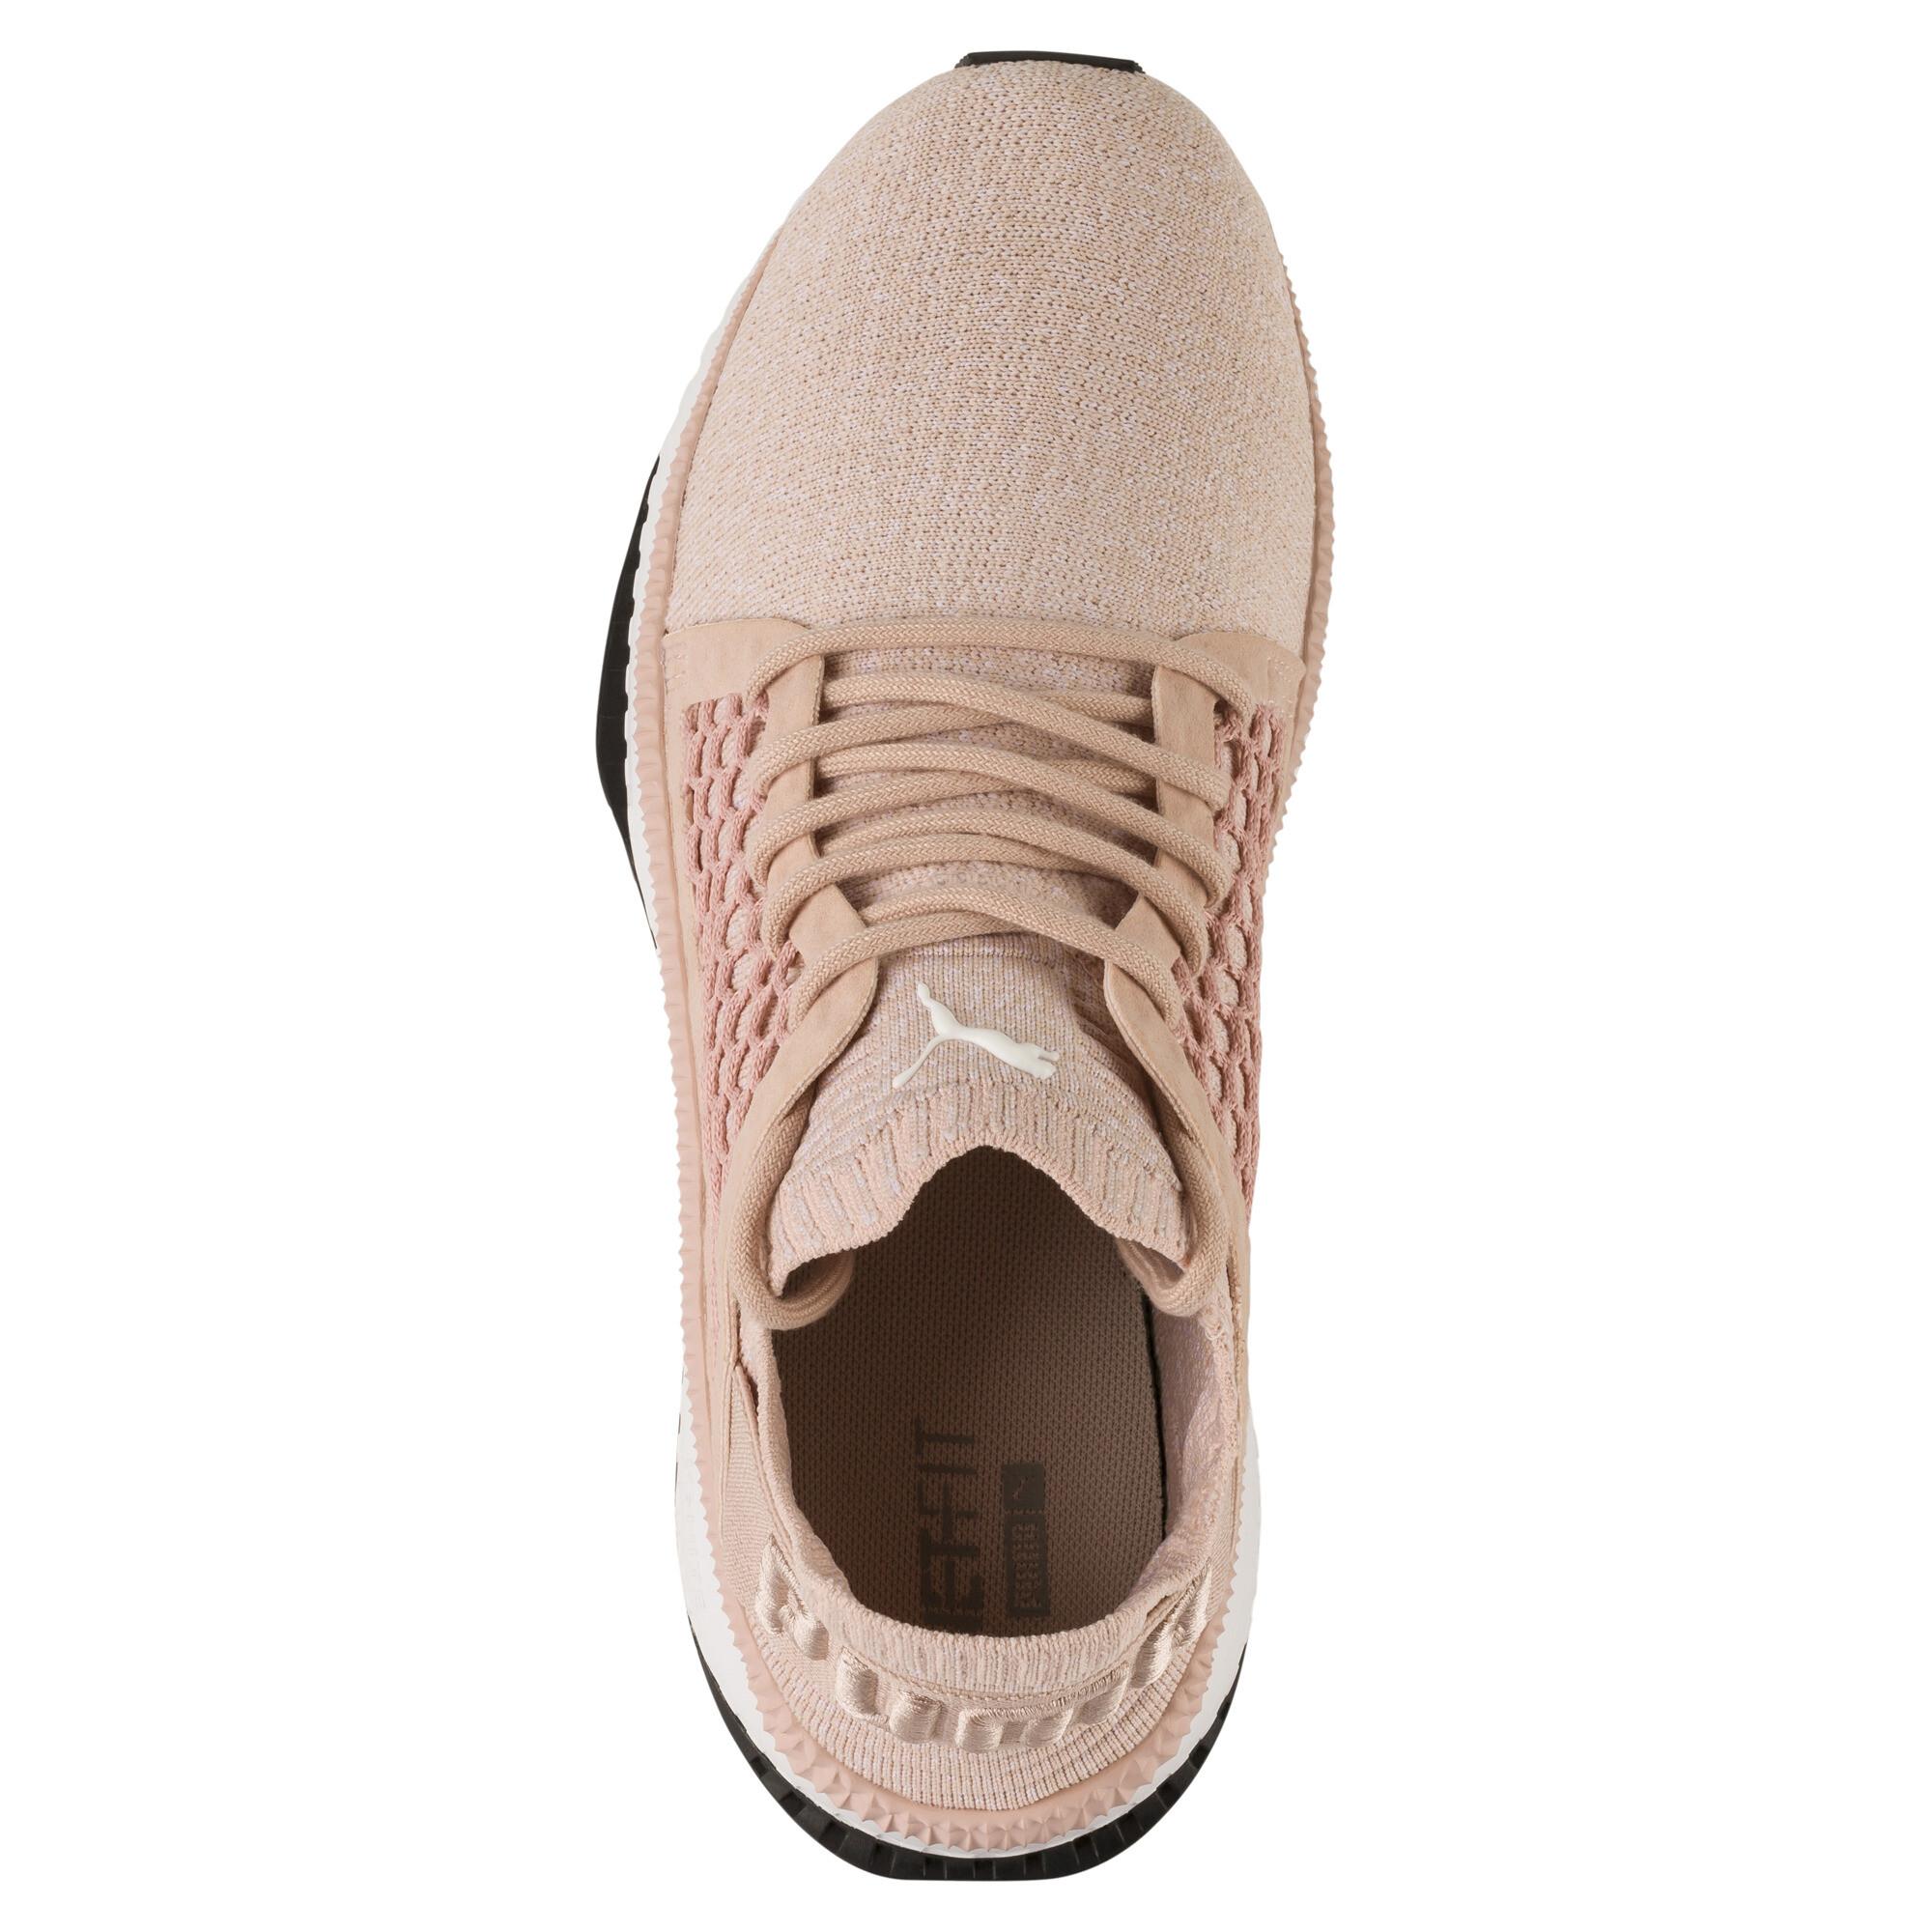 PUMA-TSUGI-NETFIT-evoKNIT-Sneaker-Frauen-Schuhe-Neu Indexbild 23